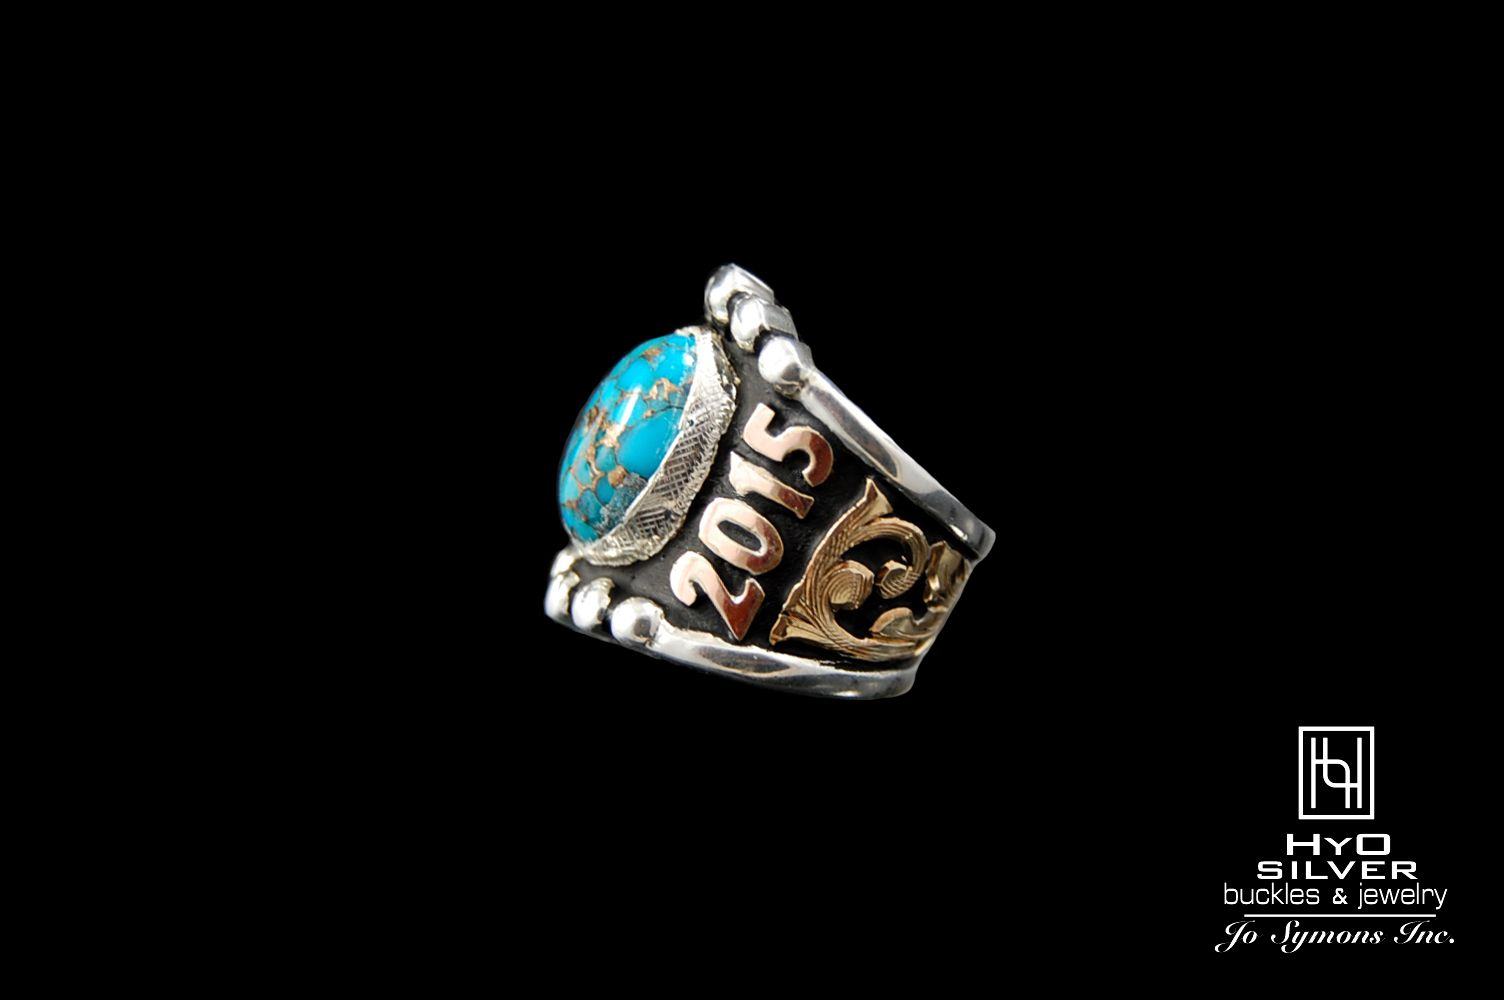 Custom Rimrock Turquoise Ring Hyo Silver Custom Class Rings Sterling Silver Rings Turquoise Statement Rings